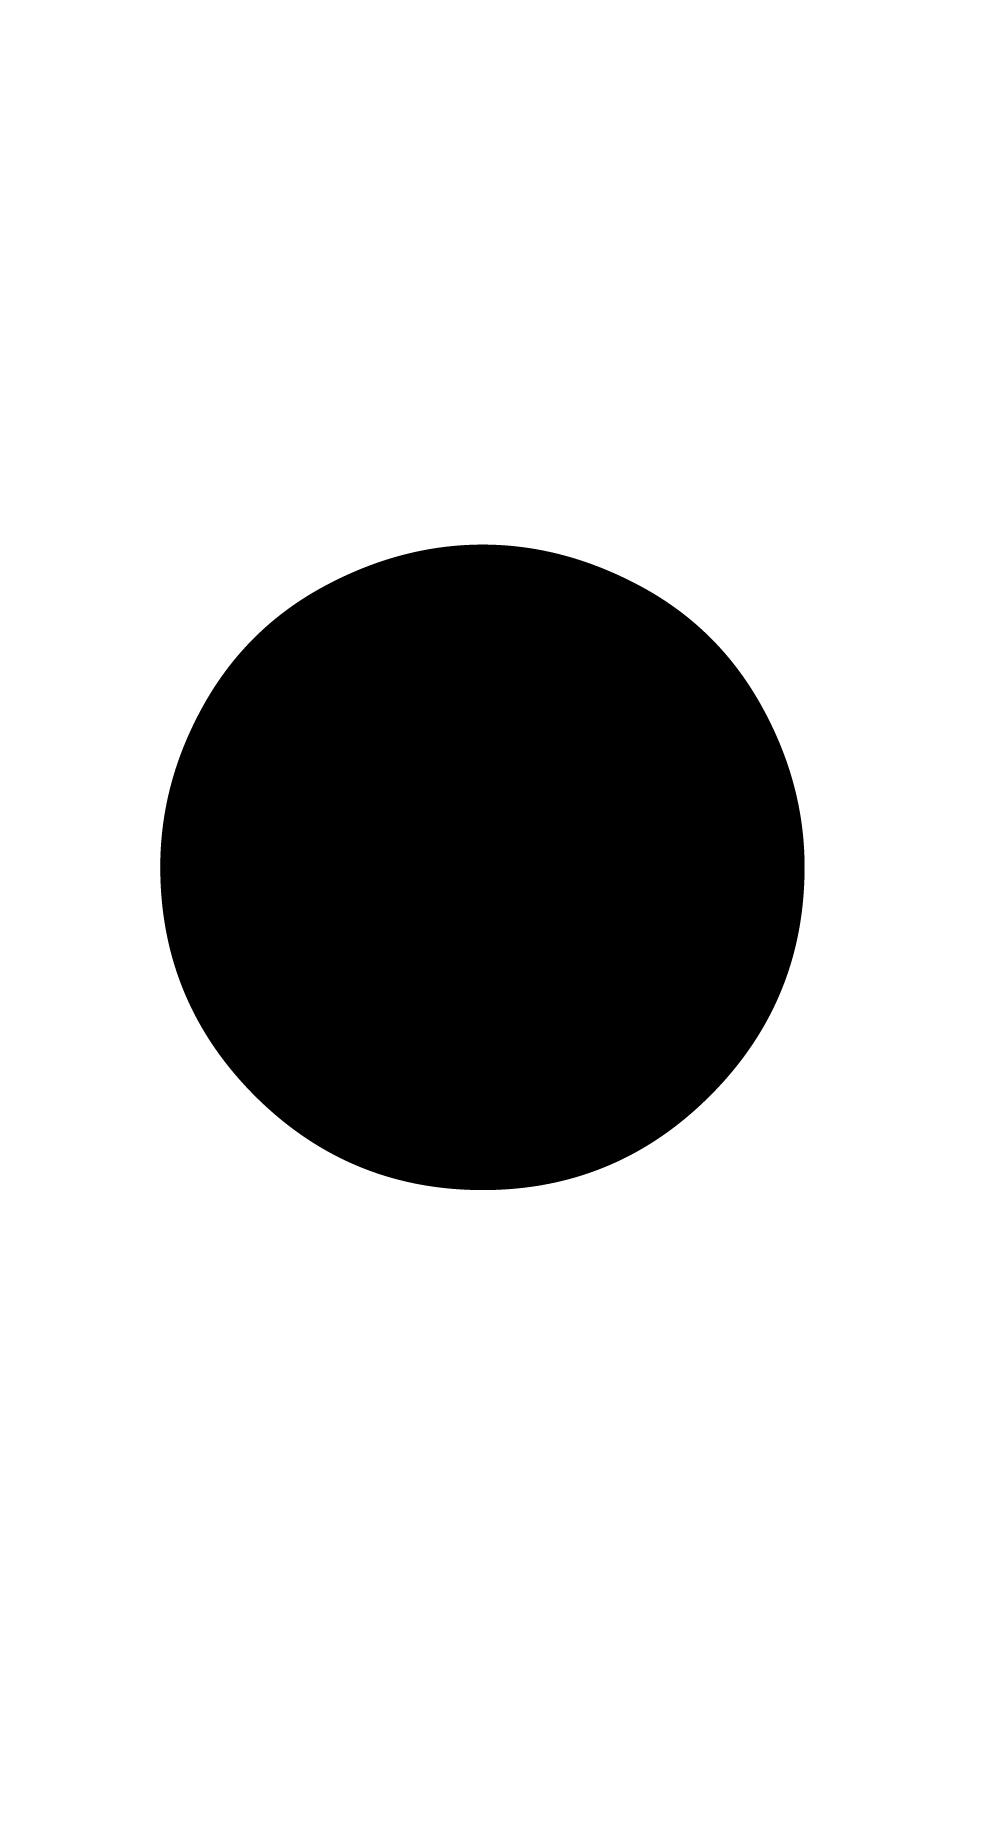 [MISSING IMAGE: icon-bullet.jpg]